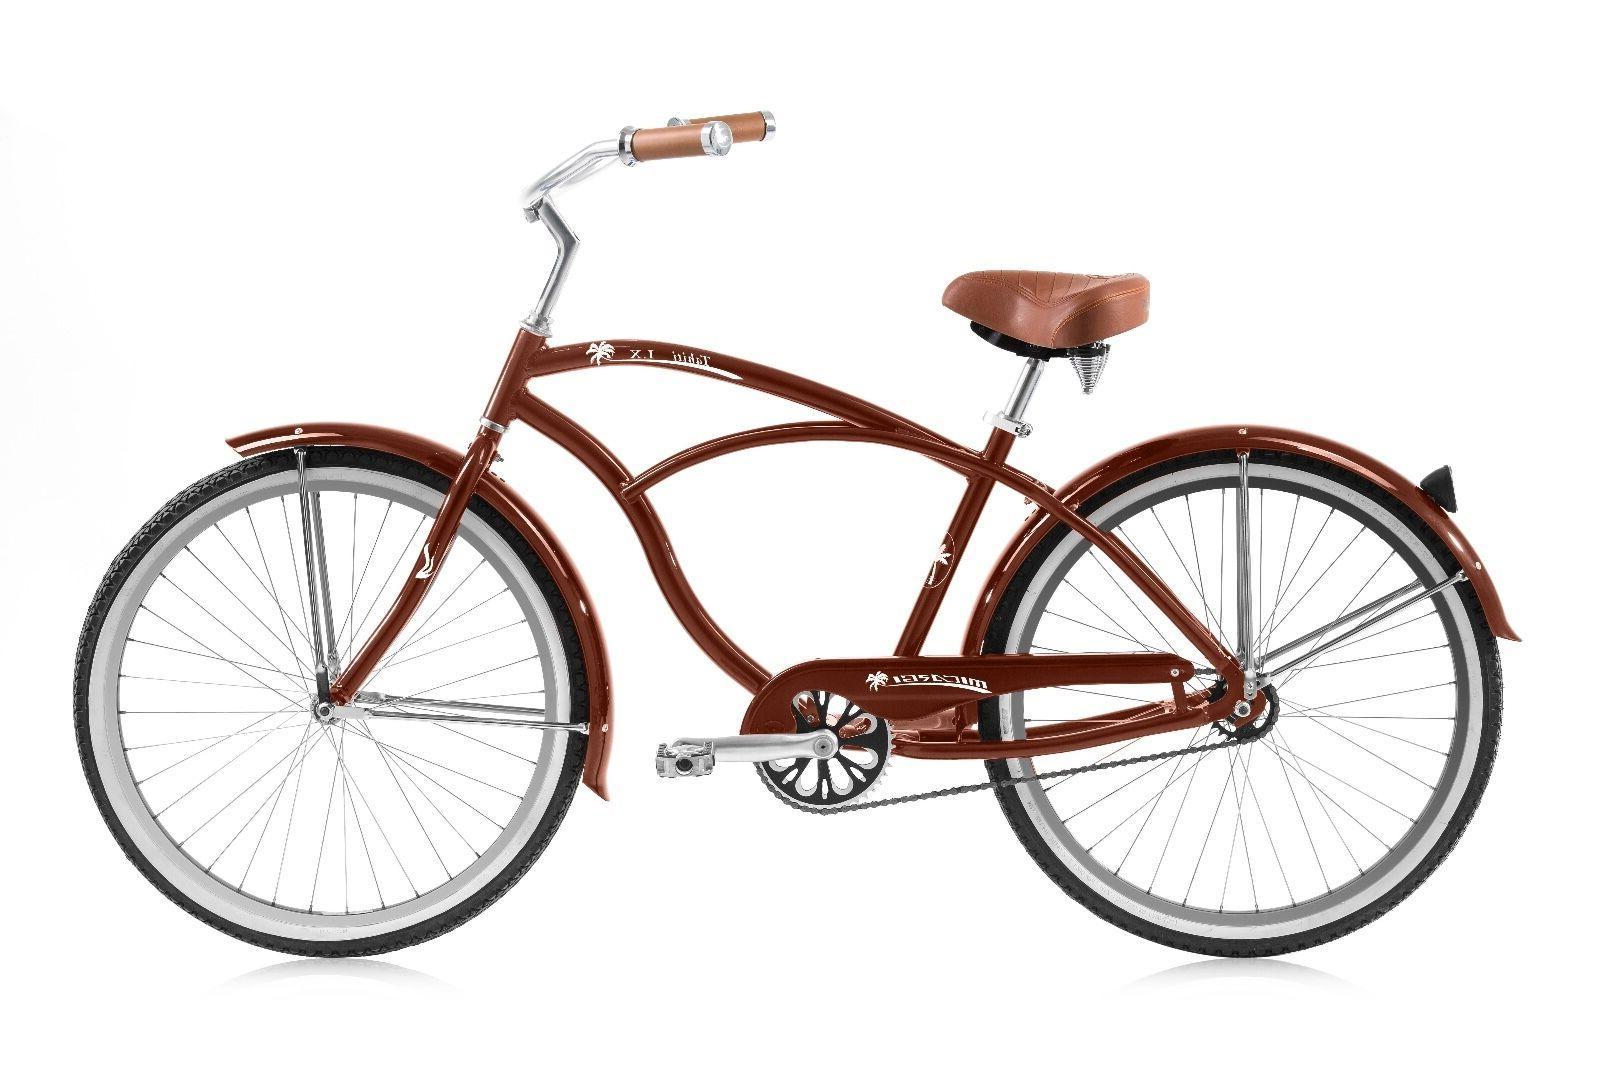 Micargi Tahiti LX, Bike Black, and Red